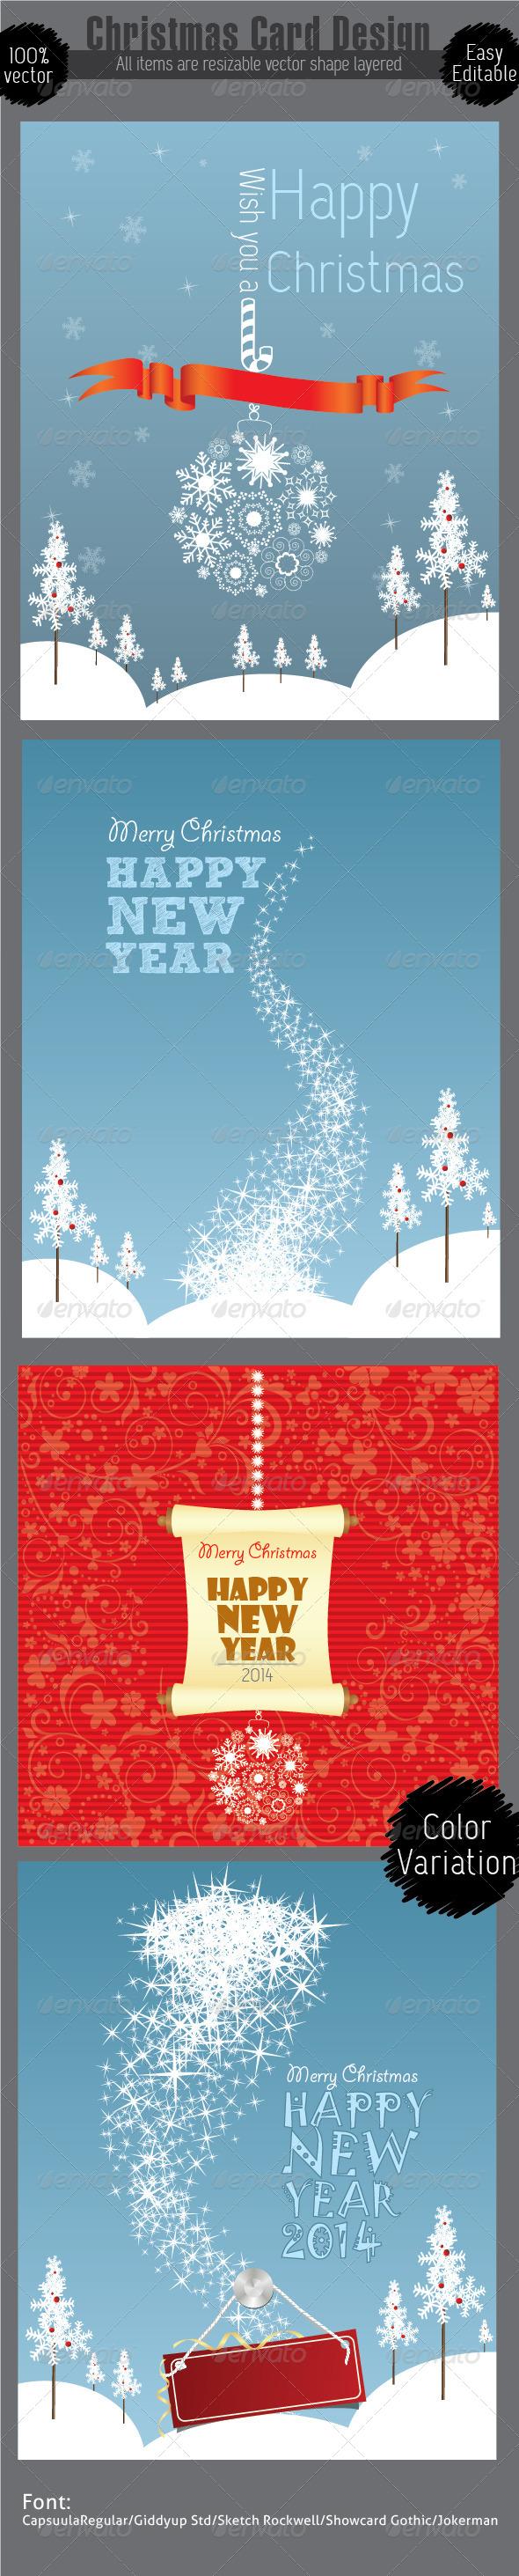 GraphicRiver Christmas Card Design Template 6465013